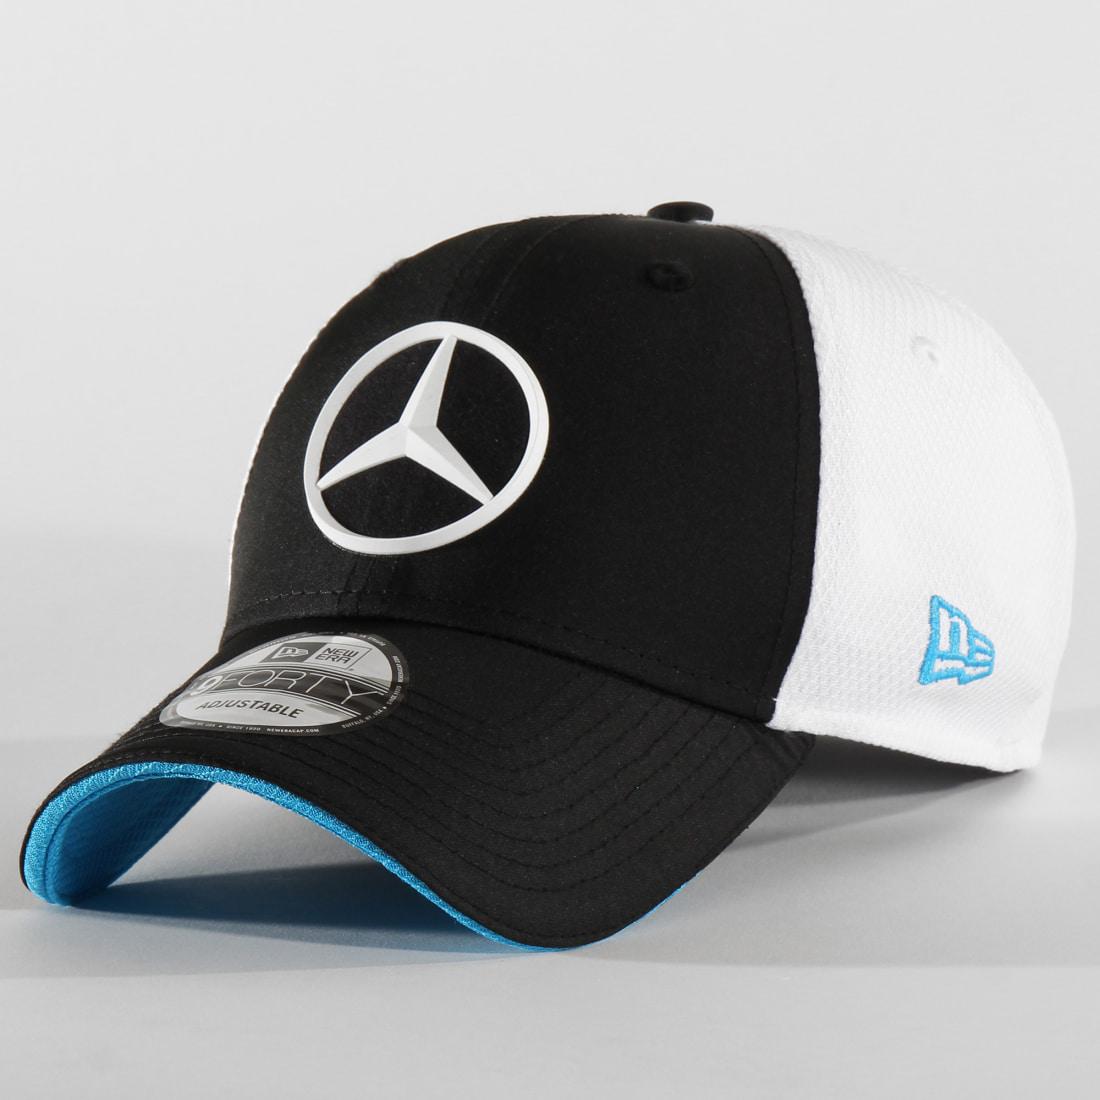 Original Mercedes-Benz Casquette de Baseball Casquette Unimog Noir Q283000